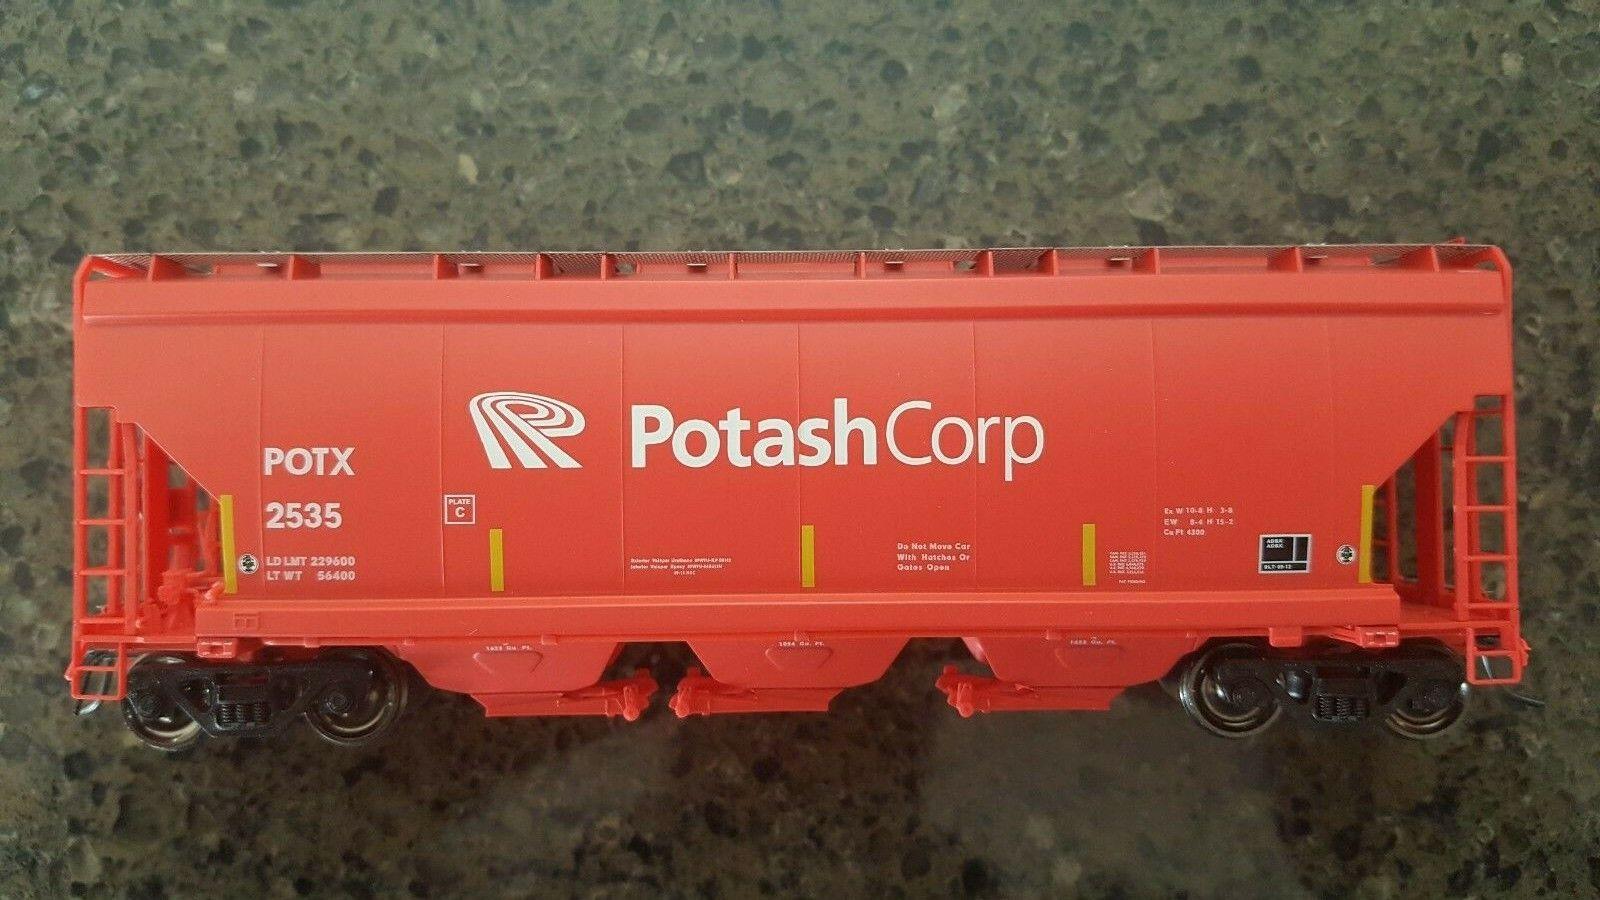 HO scale NARC PWRS NSC 4300 Cu. Ft. PotashCorp Potash Covered Hopper